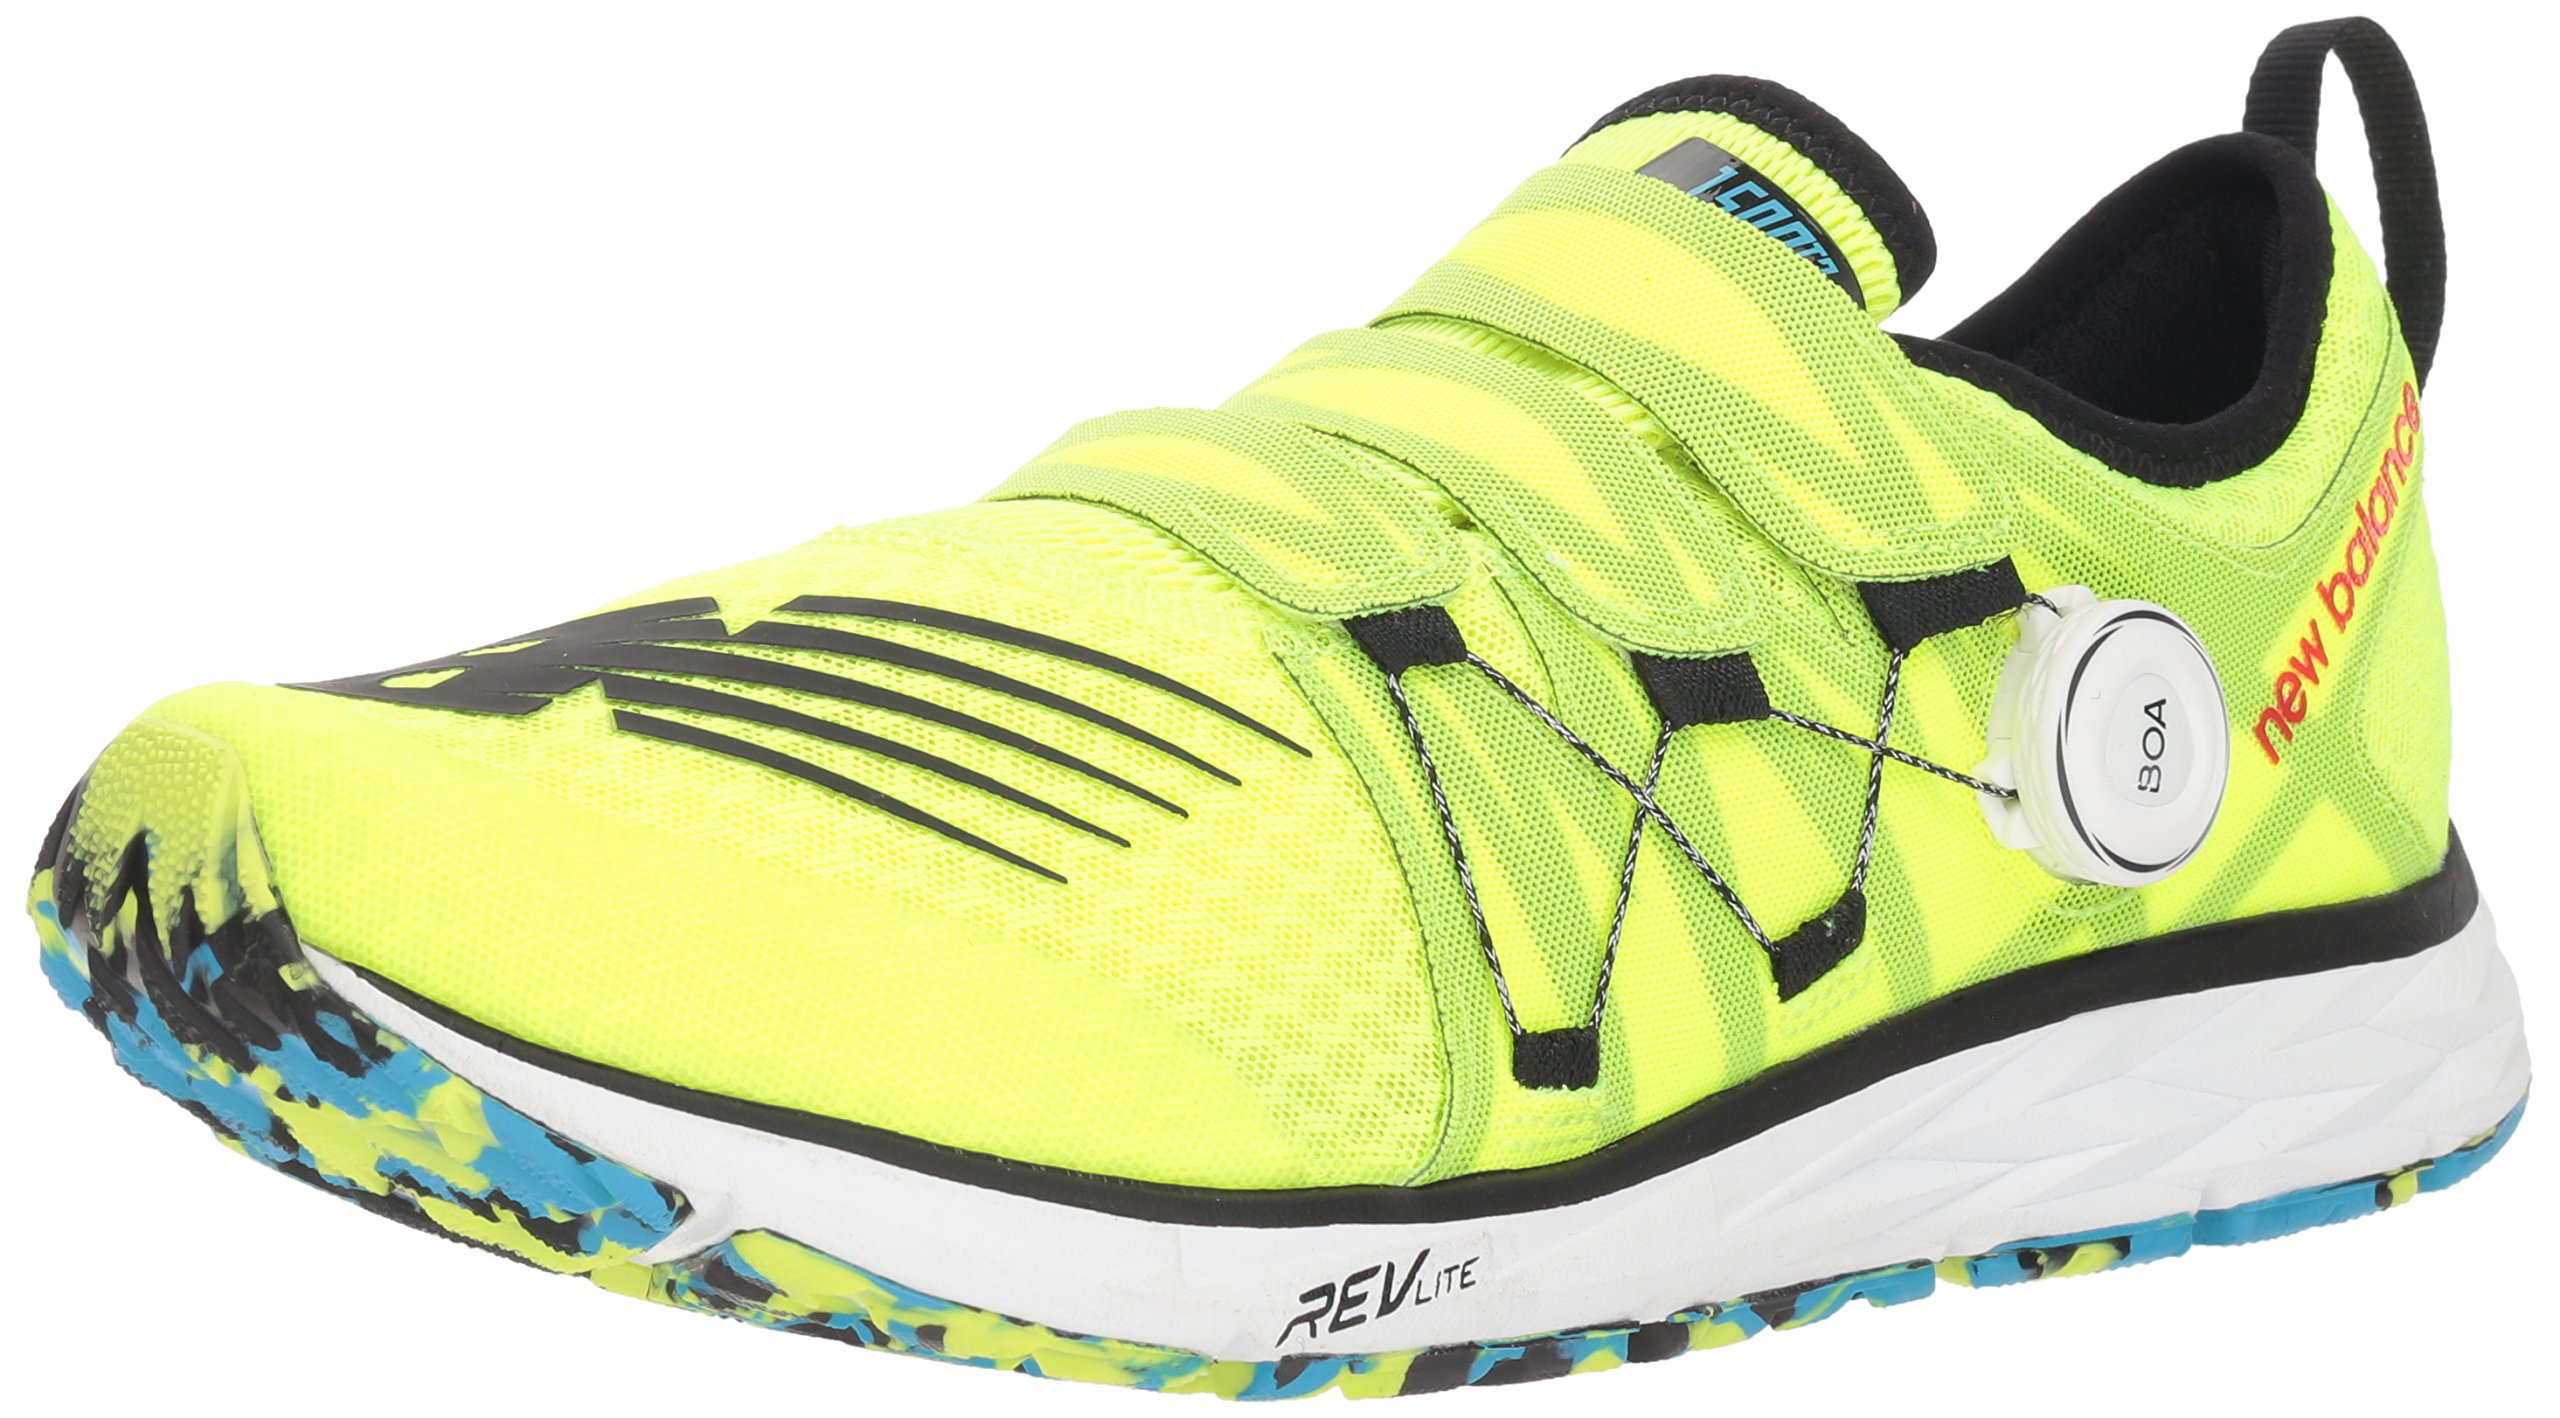 5b01844958a00 Galleon - New Balance Men's 1500v4 Running Shoe Yellow/Black 8.5 D US